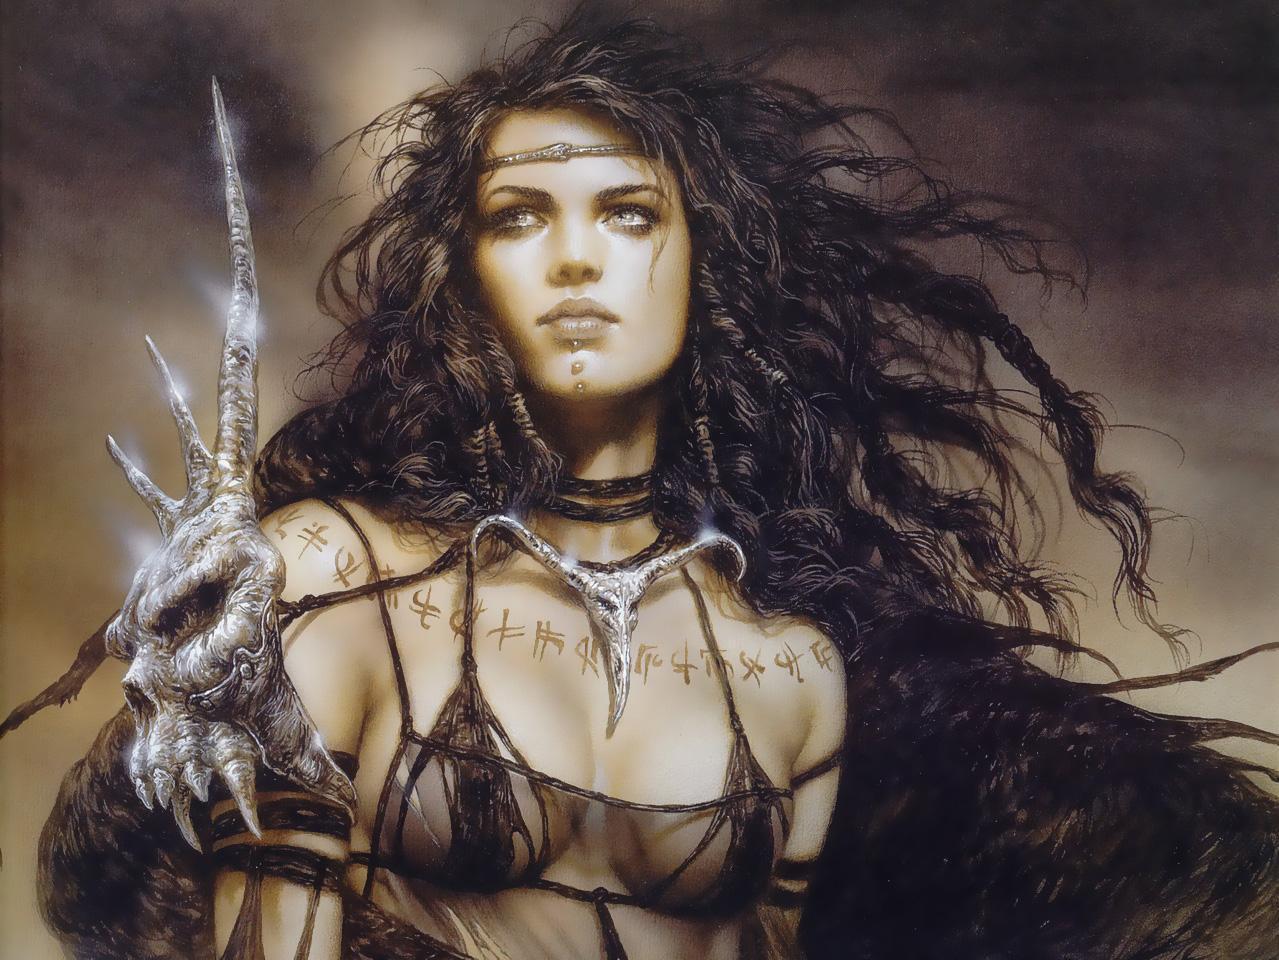 Royo Wallpaper Fantasy Art 13944082 1279 960